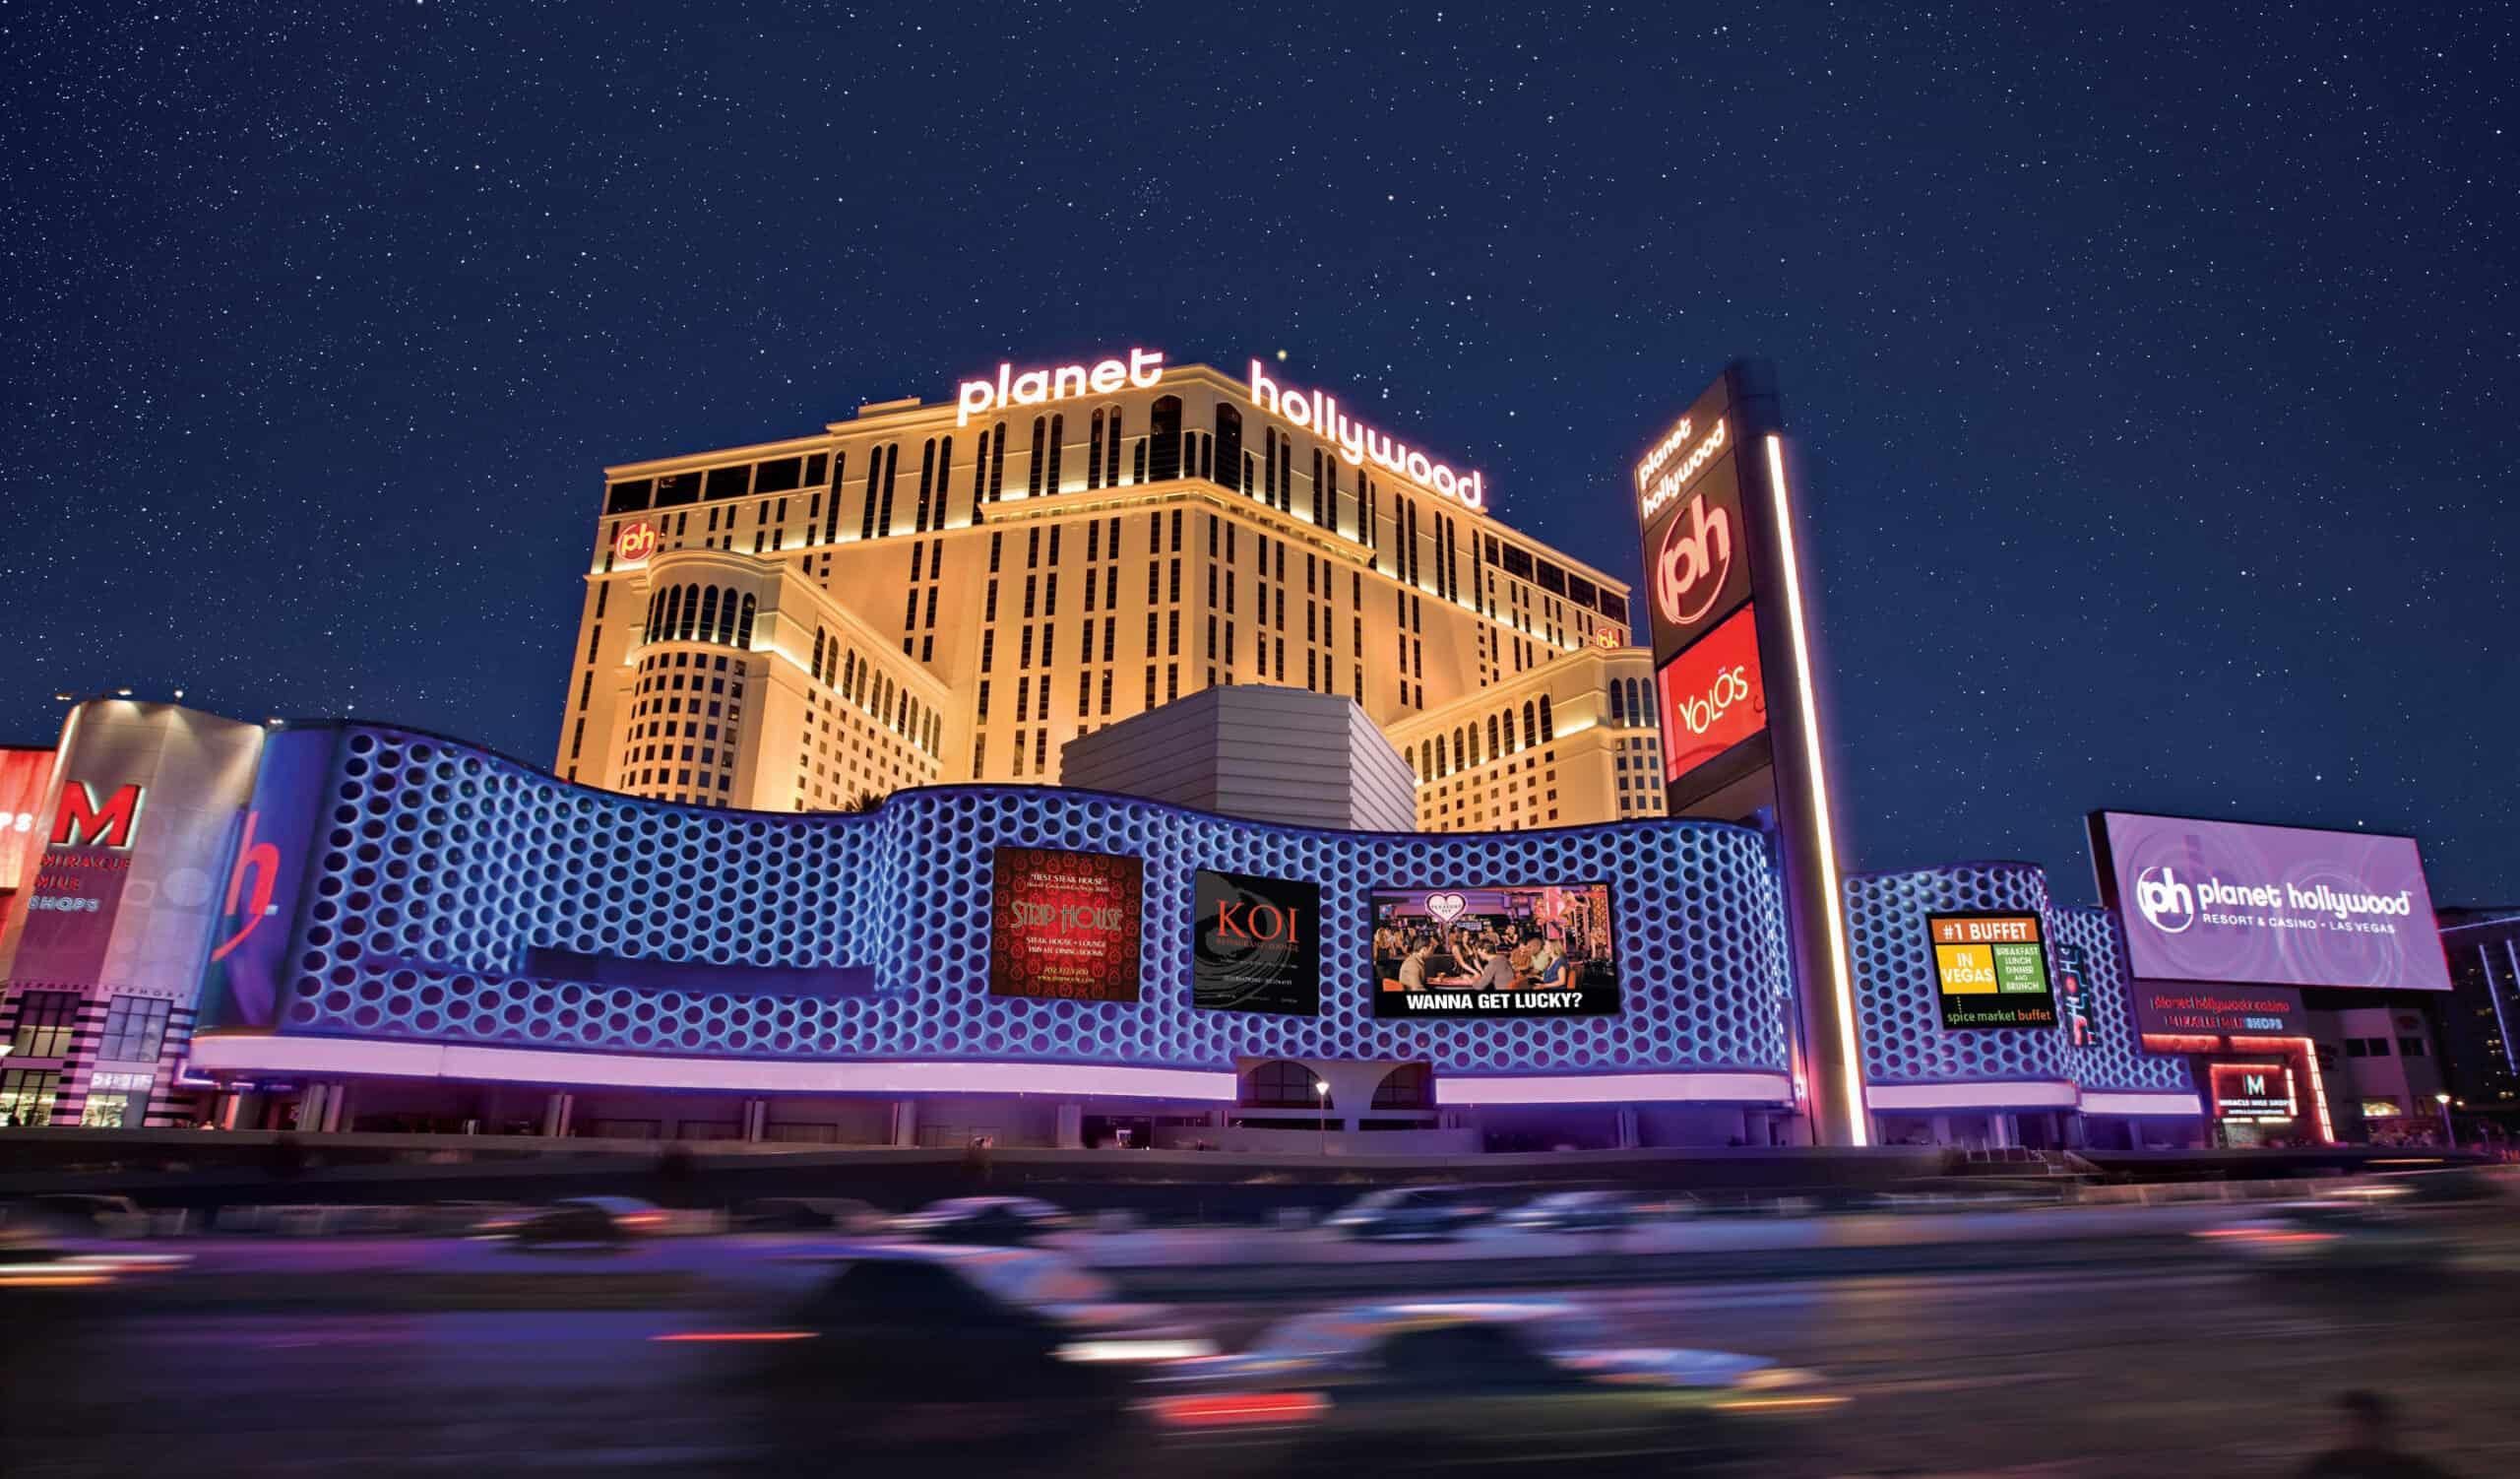 Planet Hollywood Las Vegas Exterior